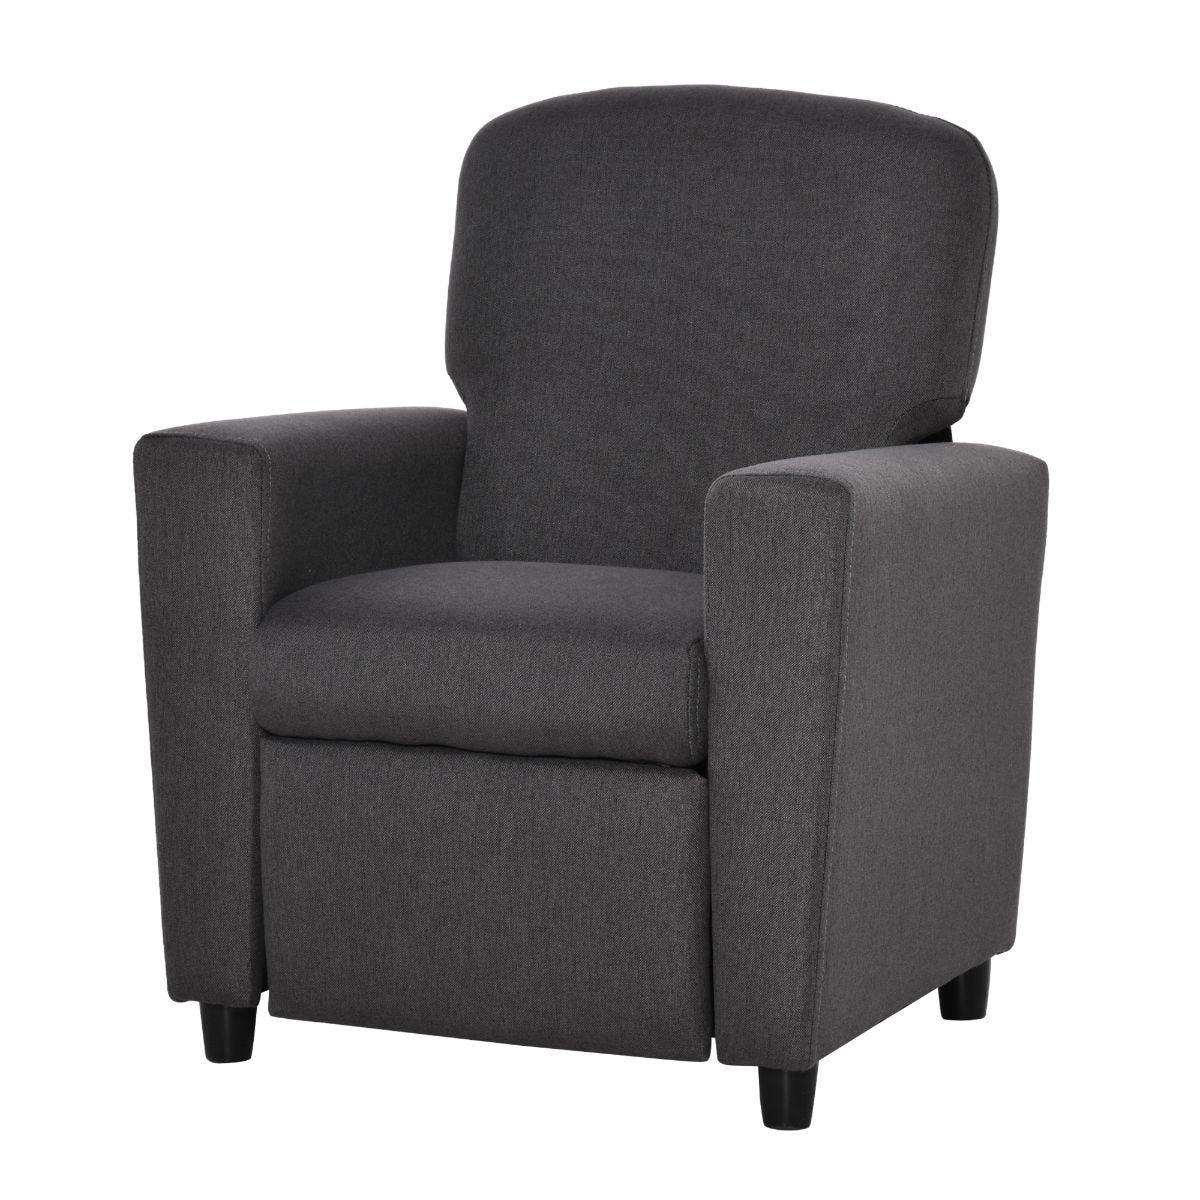 HOMCOM Kids Sofa with Footrest Linen Recliner Armchair Playroom Bedroom Grey